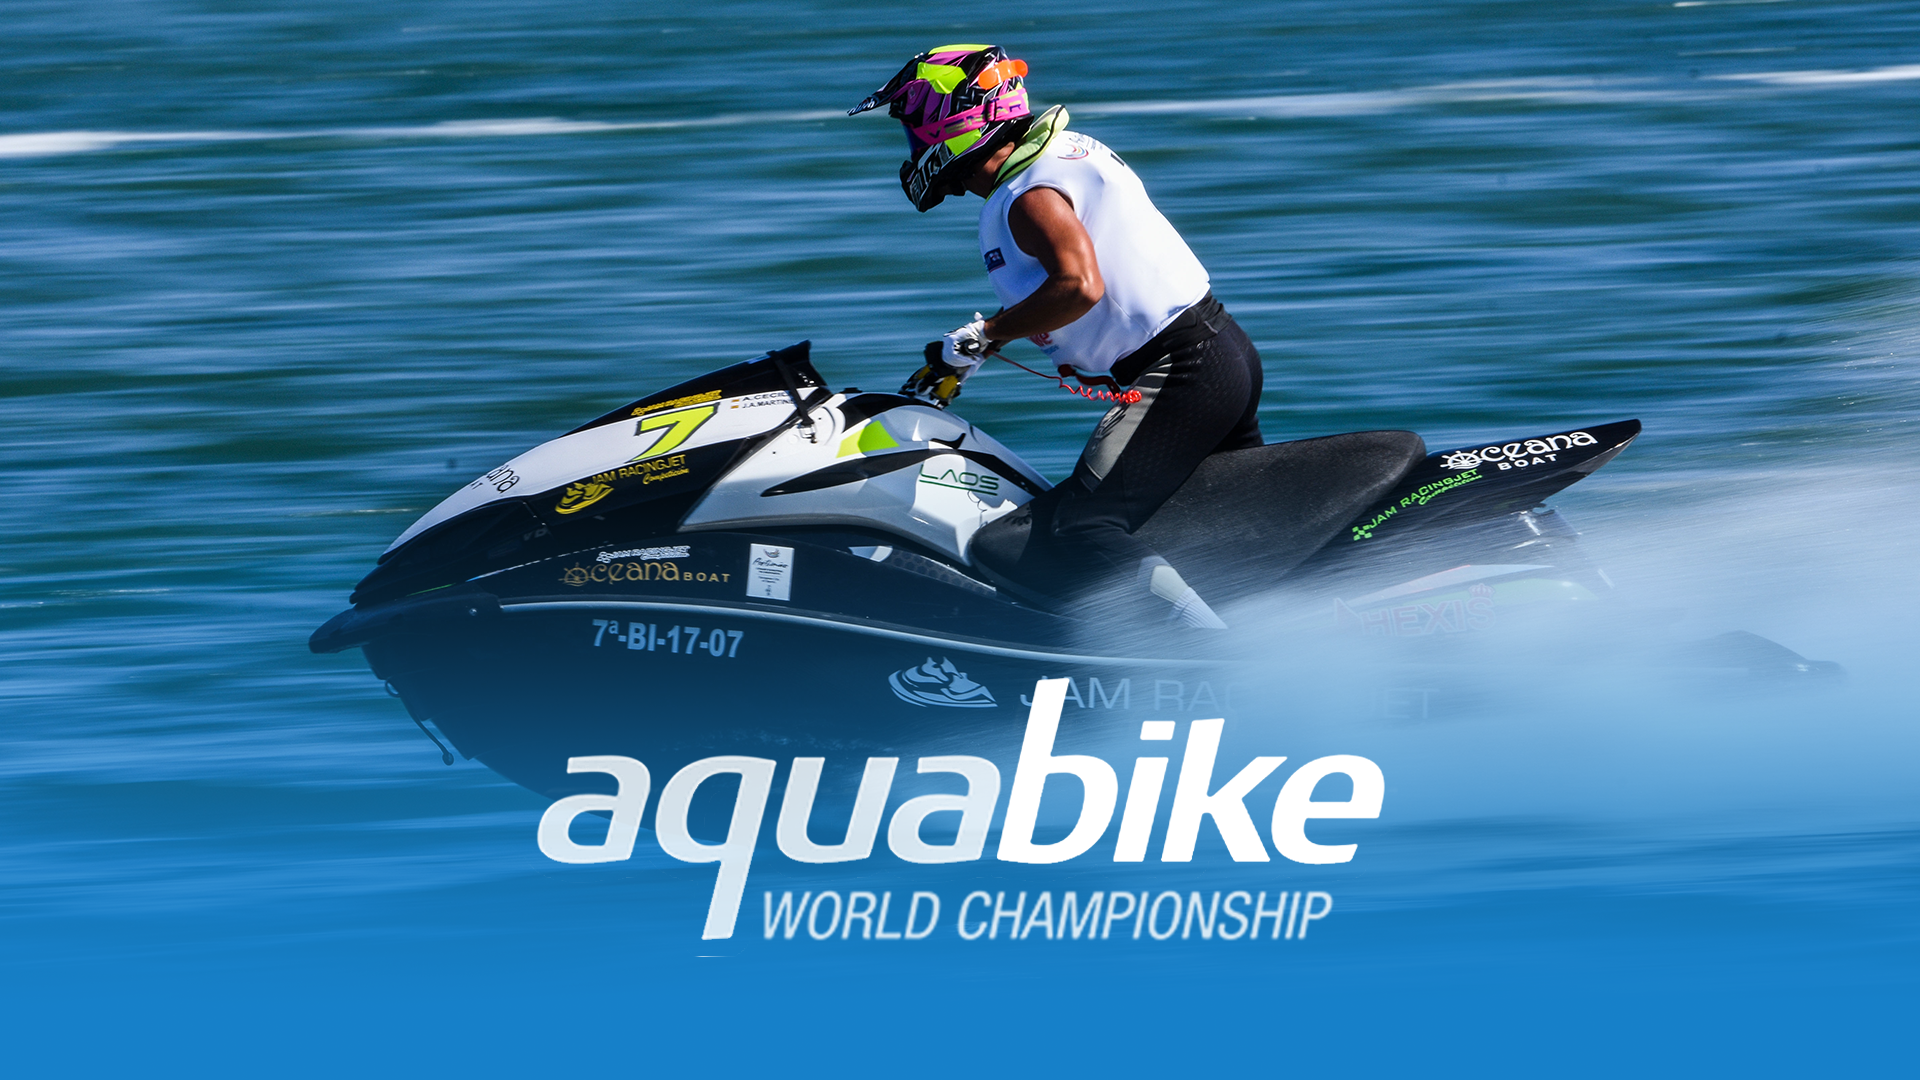 UIM ABP Aquabike World Championship 2019